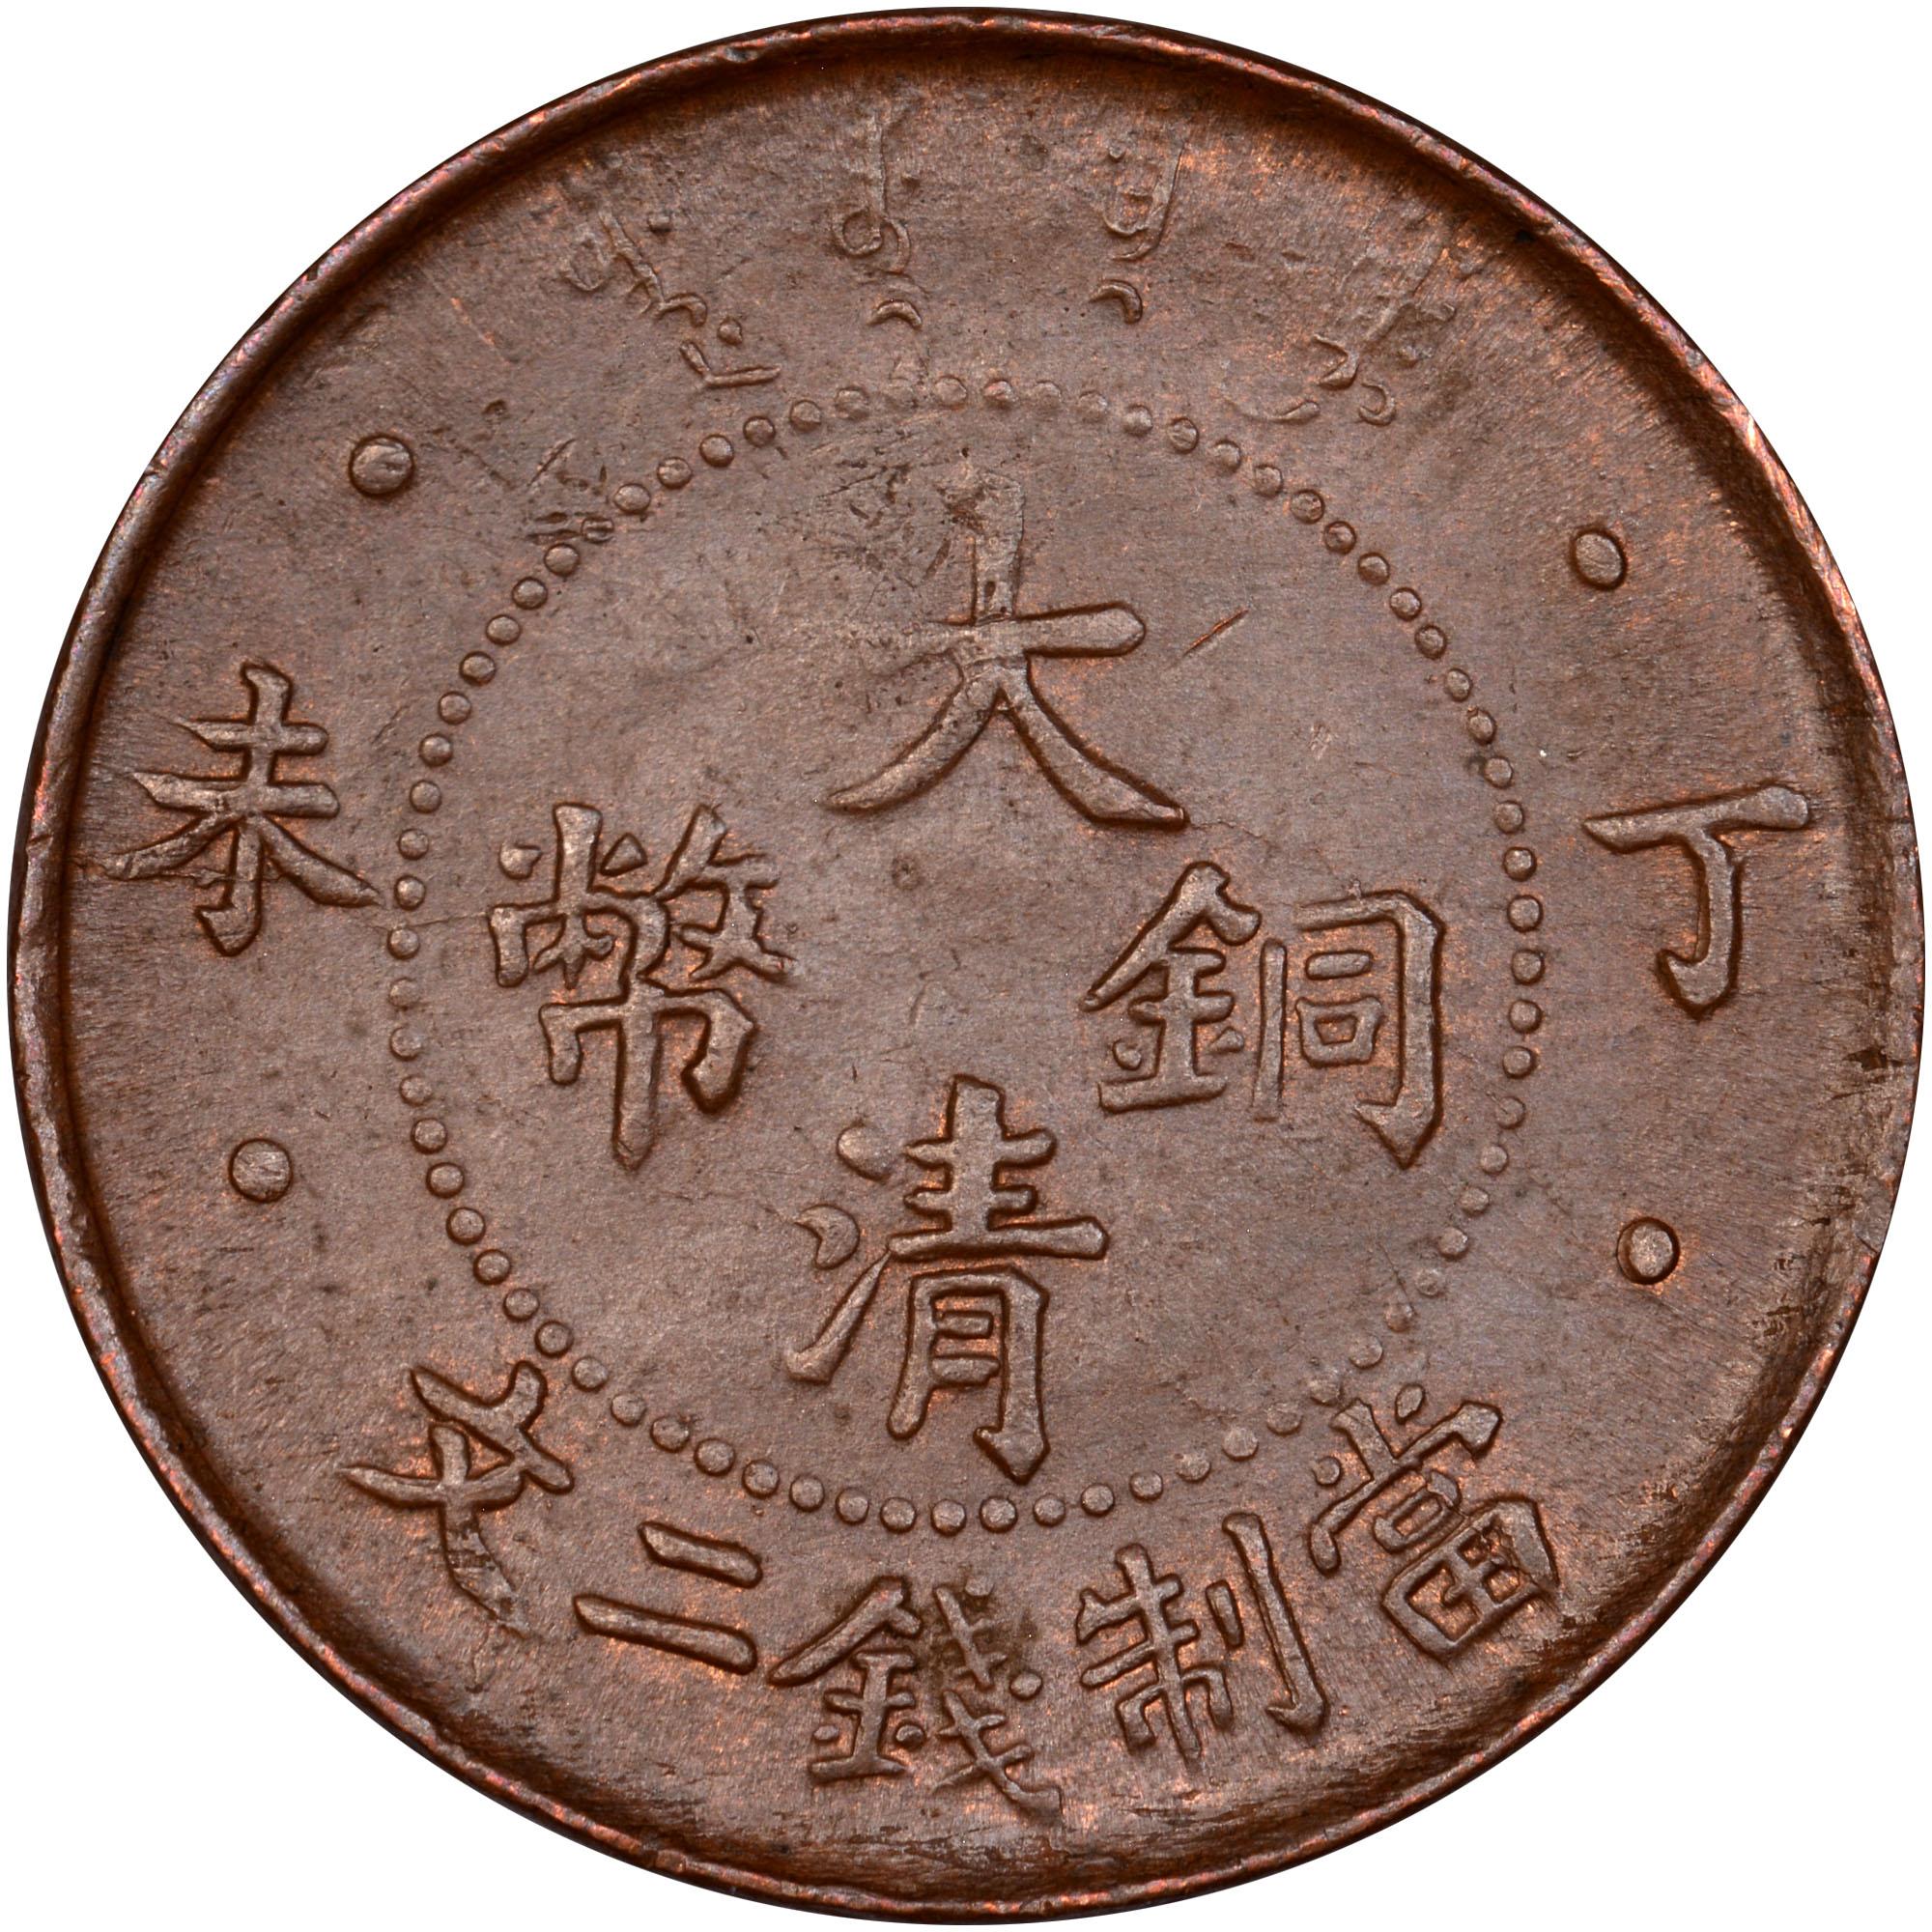 1907 China EMPIRE 2 Cash obverse